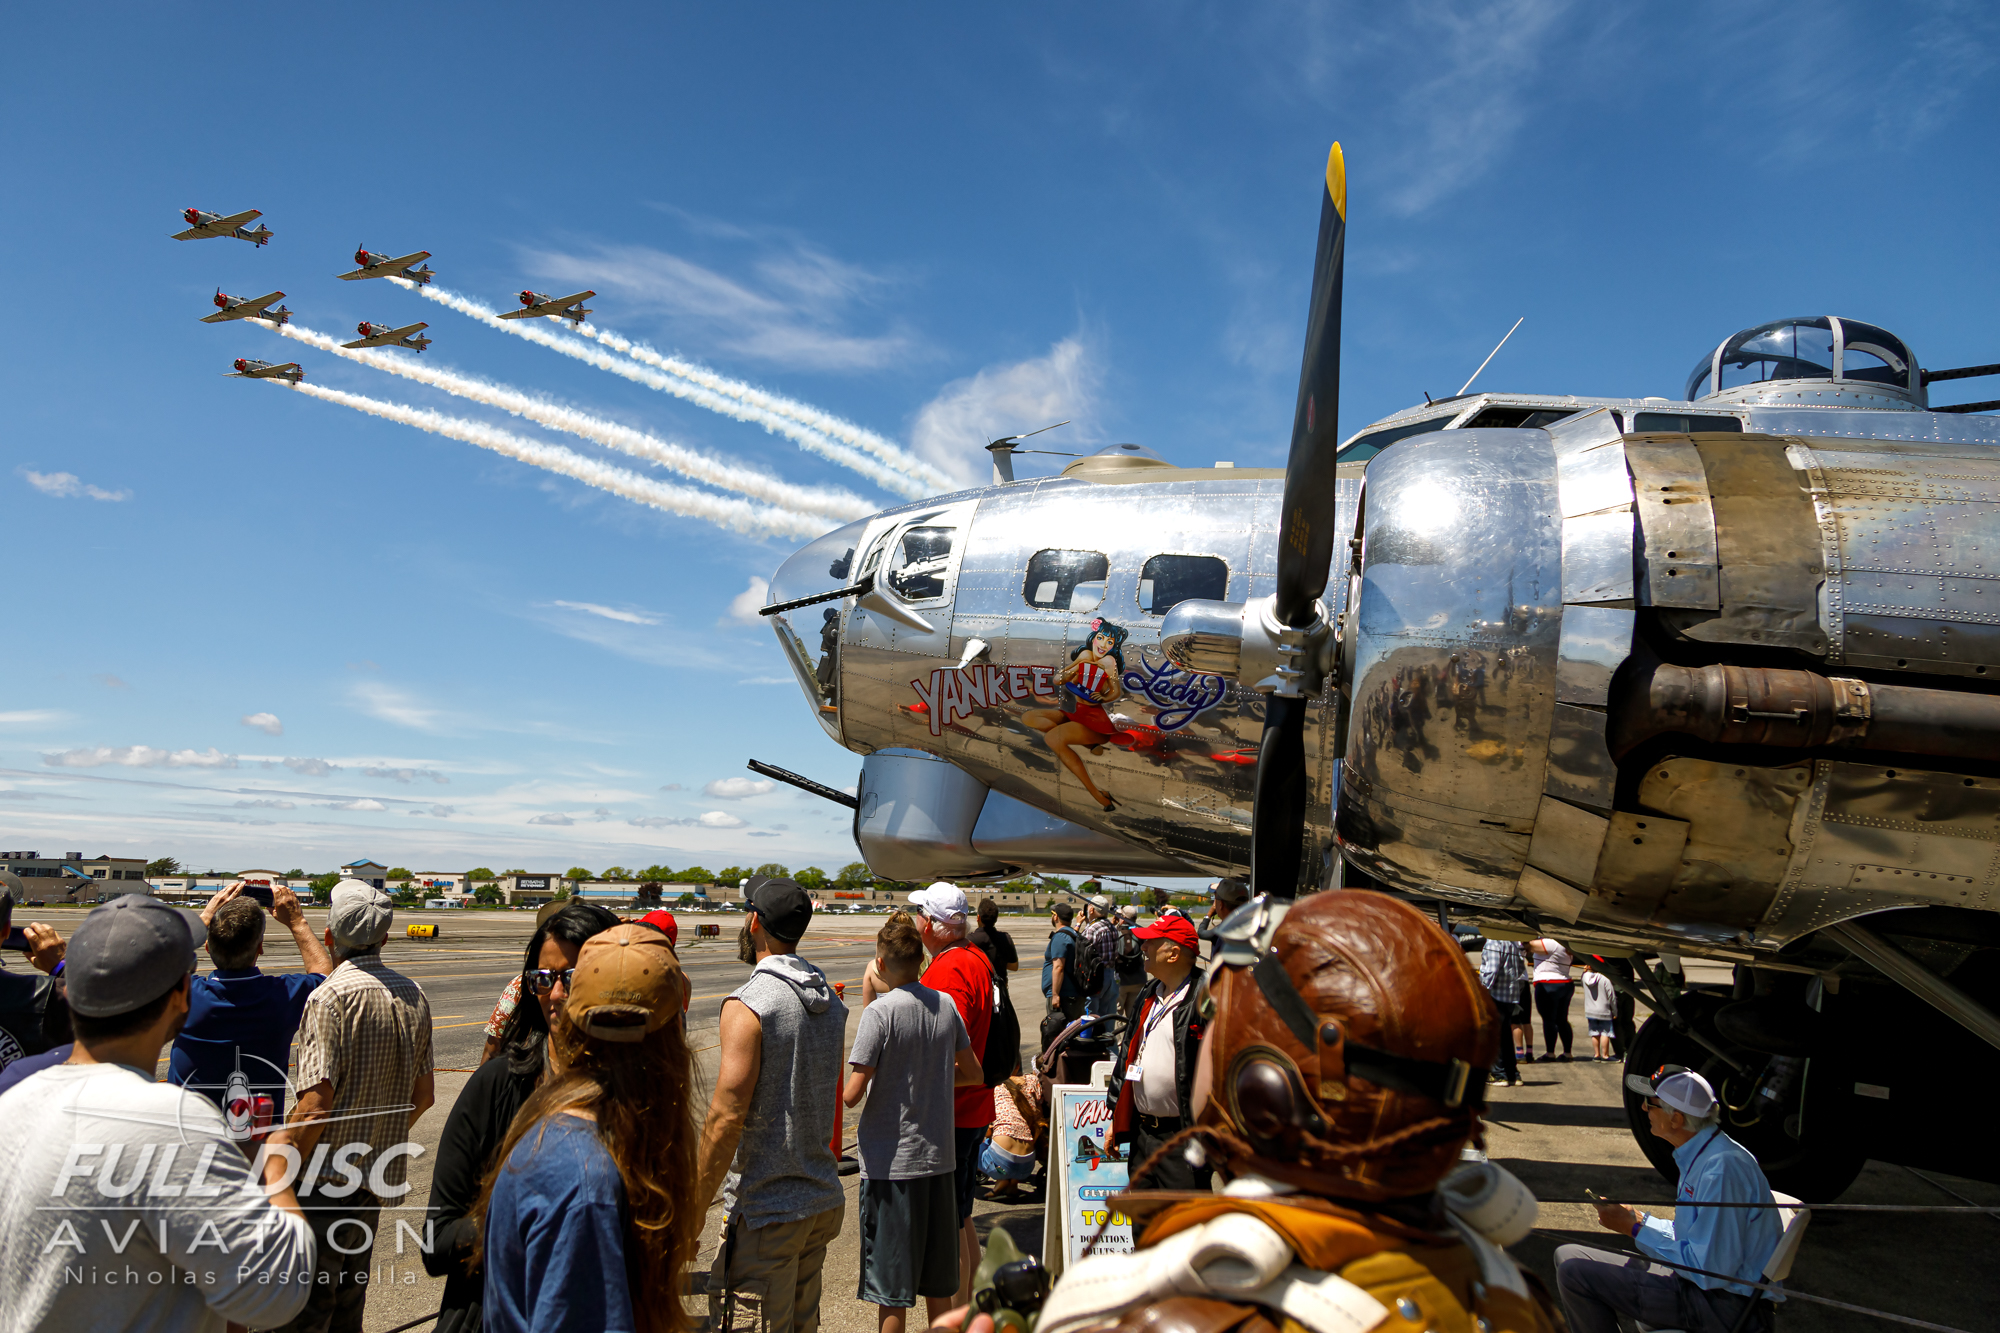 americanairpowermuseum_nicholaspascarella_nickpascarella_fulldiscaviation_legendsofairpower2019_aviation_warbird_skytypers_b17_yankeelady_airshow.jpg